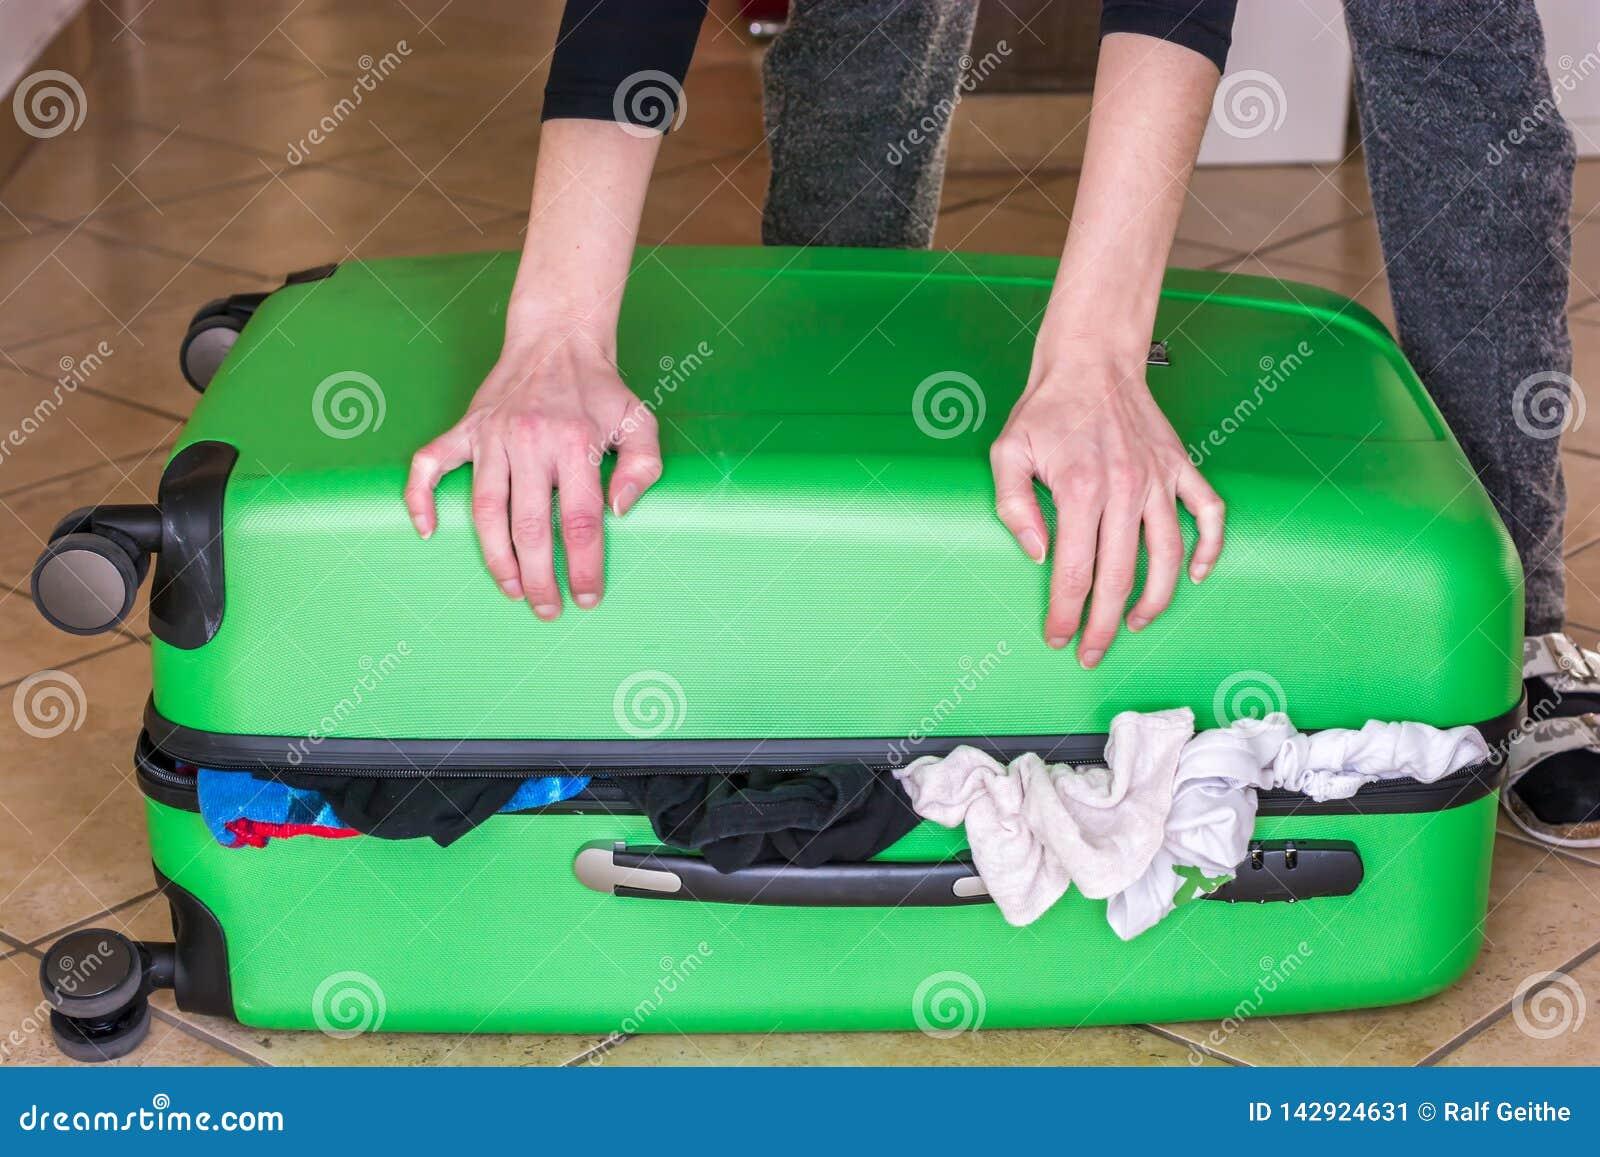 La mujer intenta cerrar la maleta sobrellenada